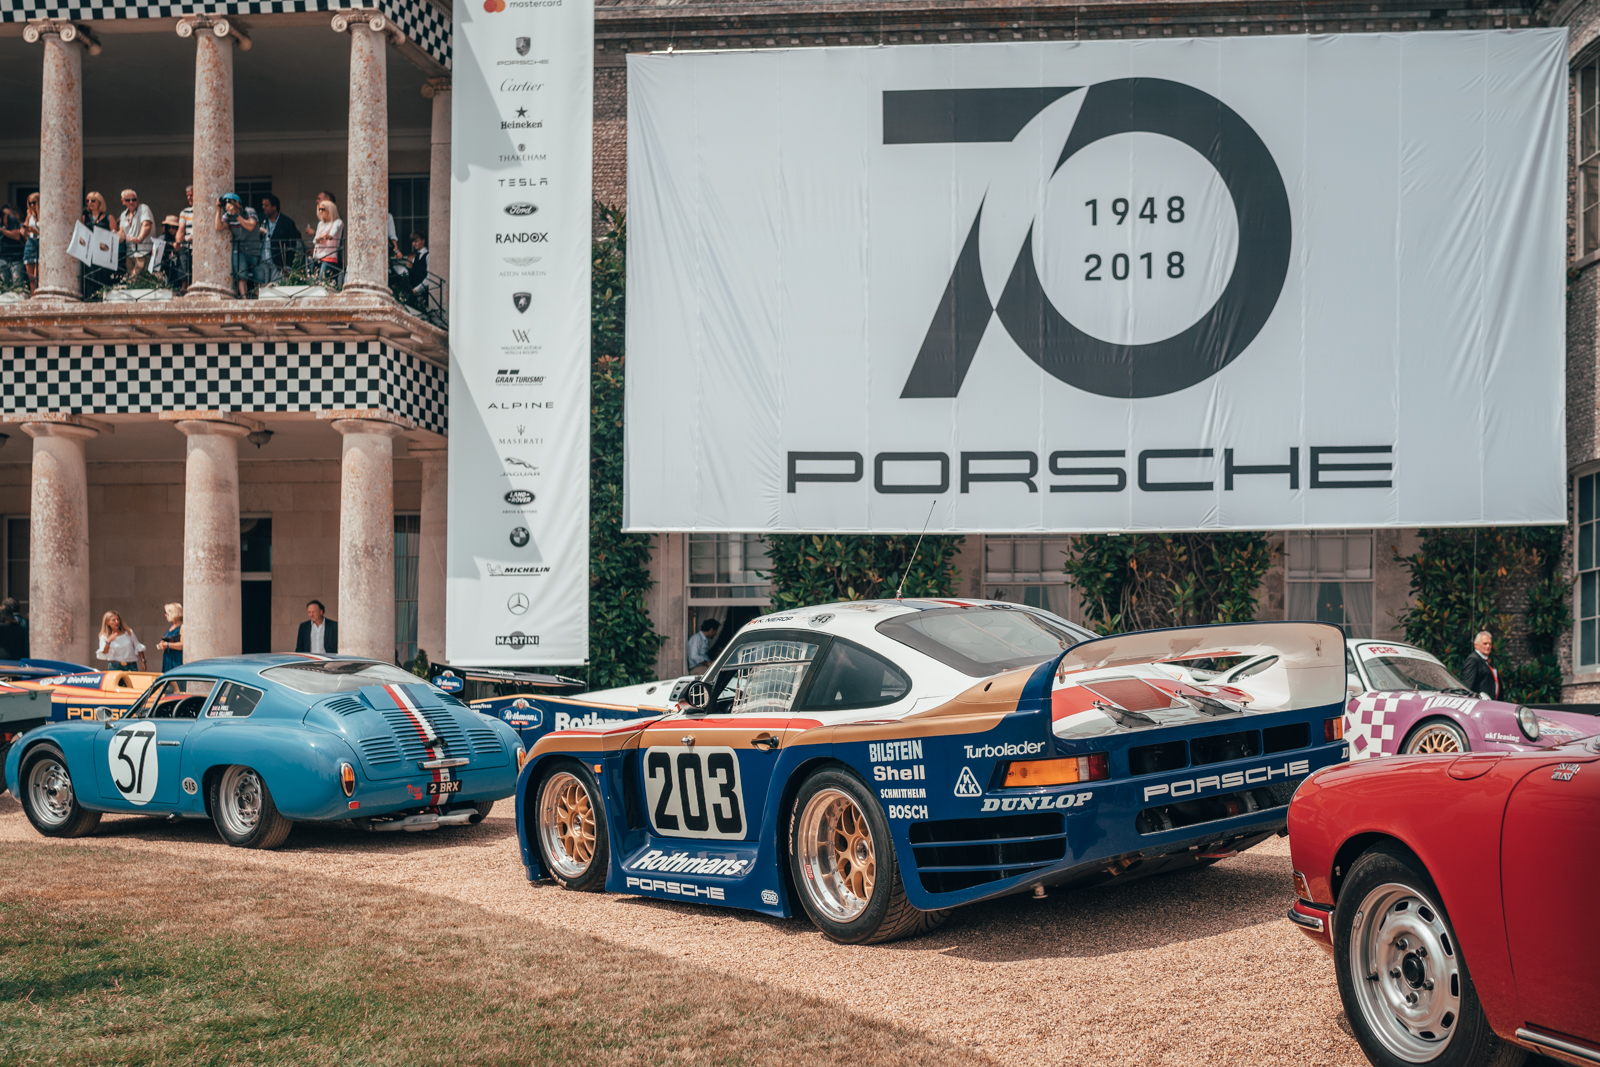 RP - Porsche Goodwood Fesitval of Speed 70 Years 2018-62.jpg